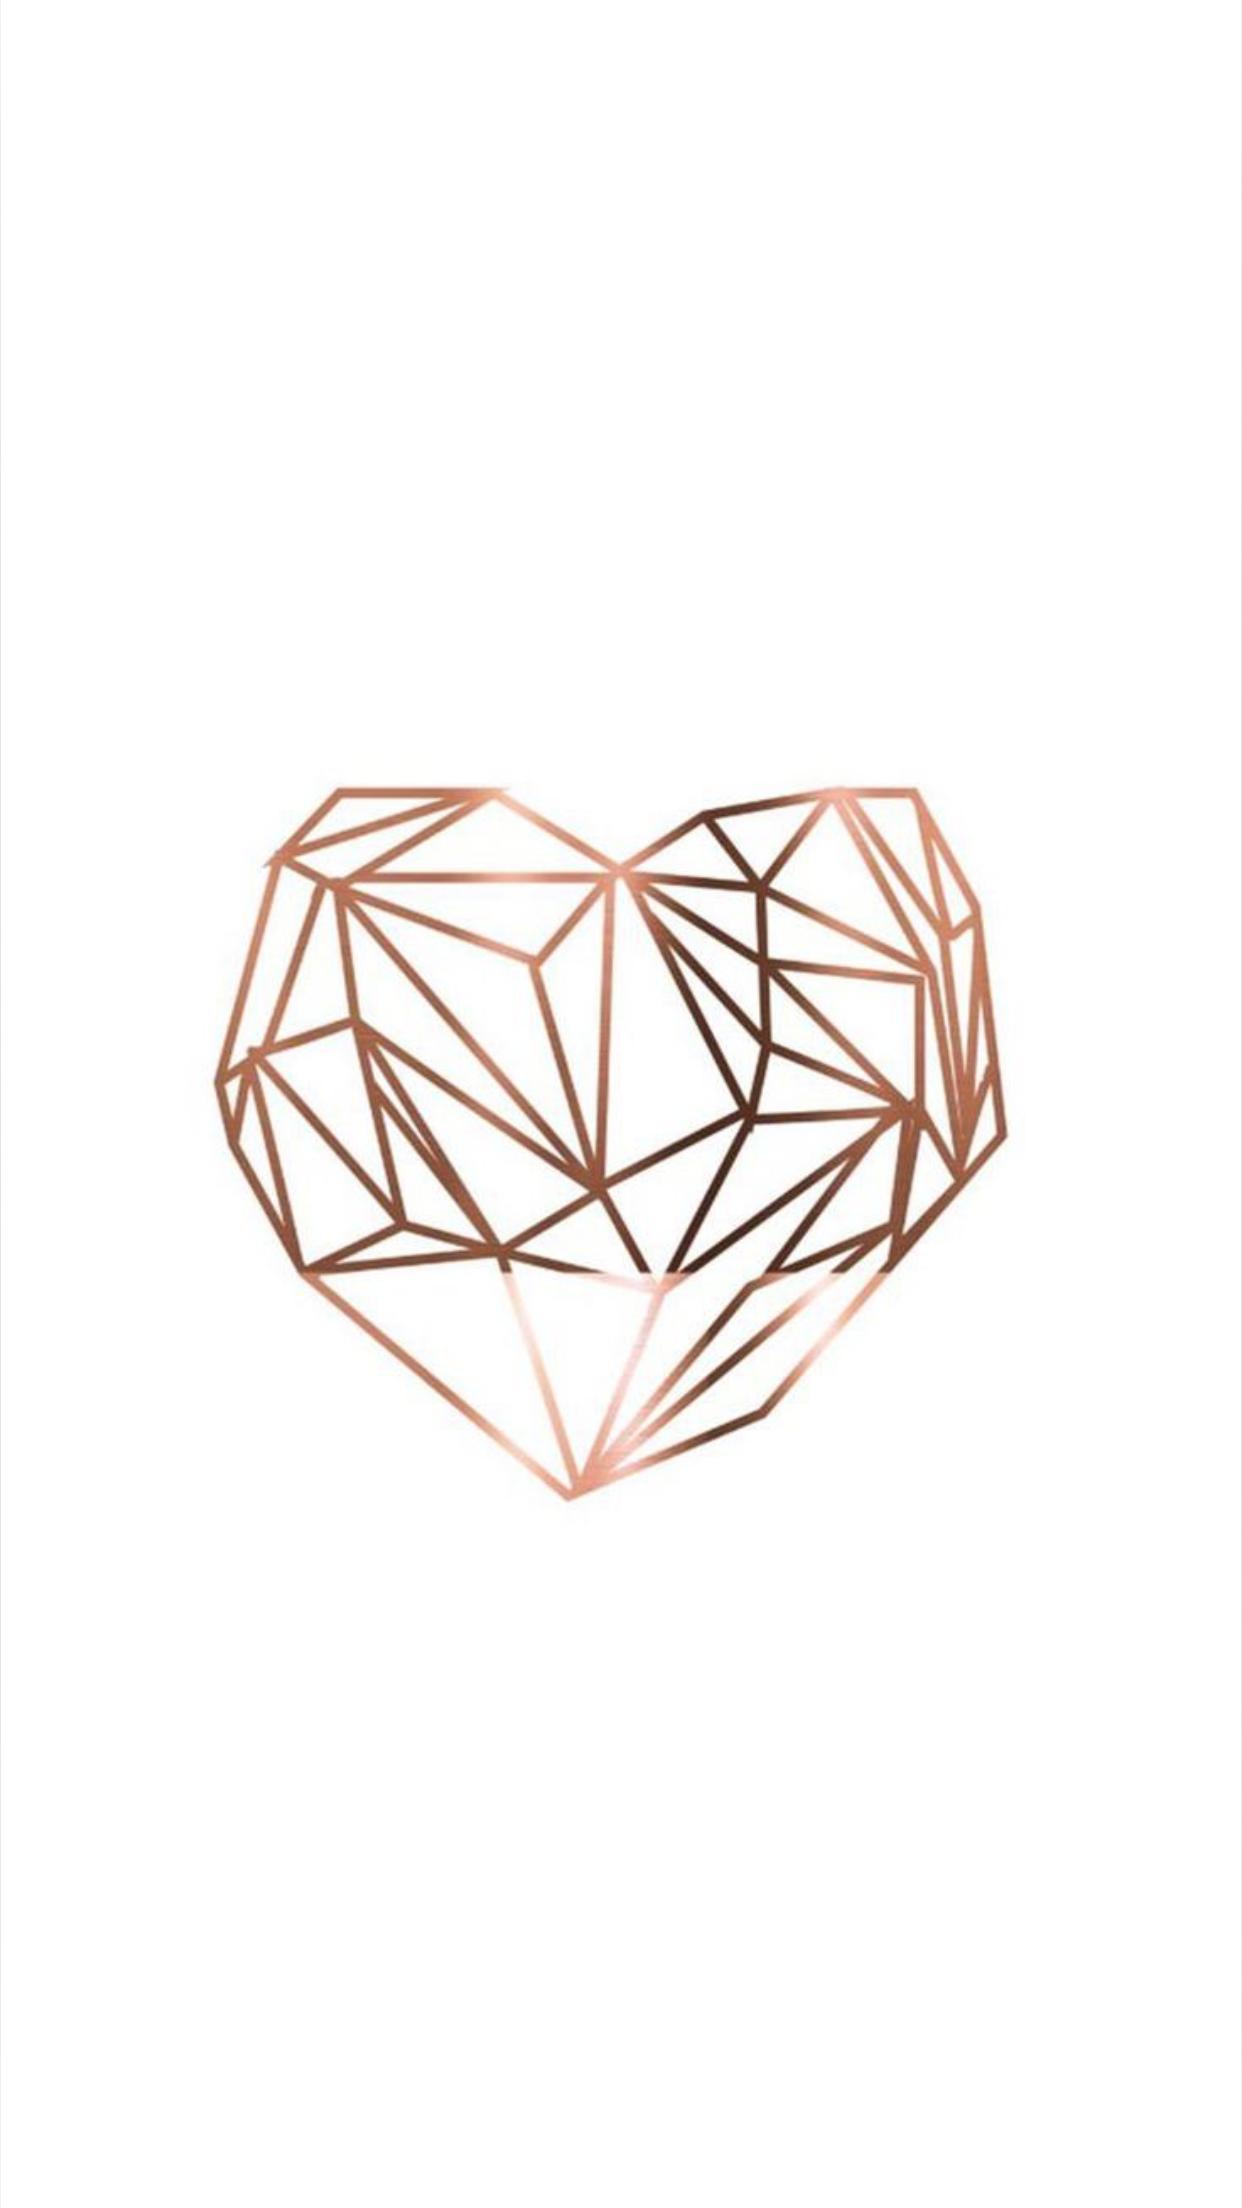 Pin By Sheena Alisha Mohammed On Iphone 7 Wallpaper Rose